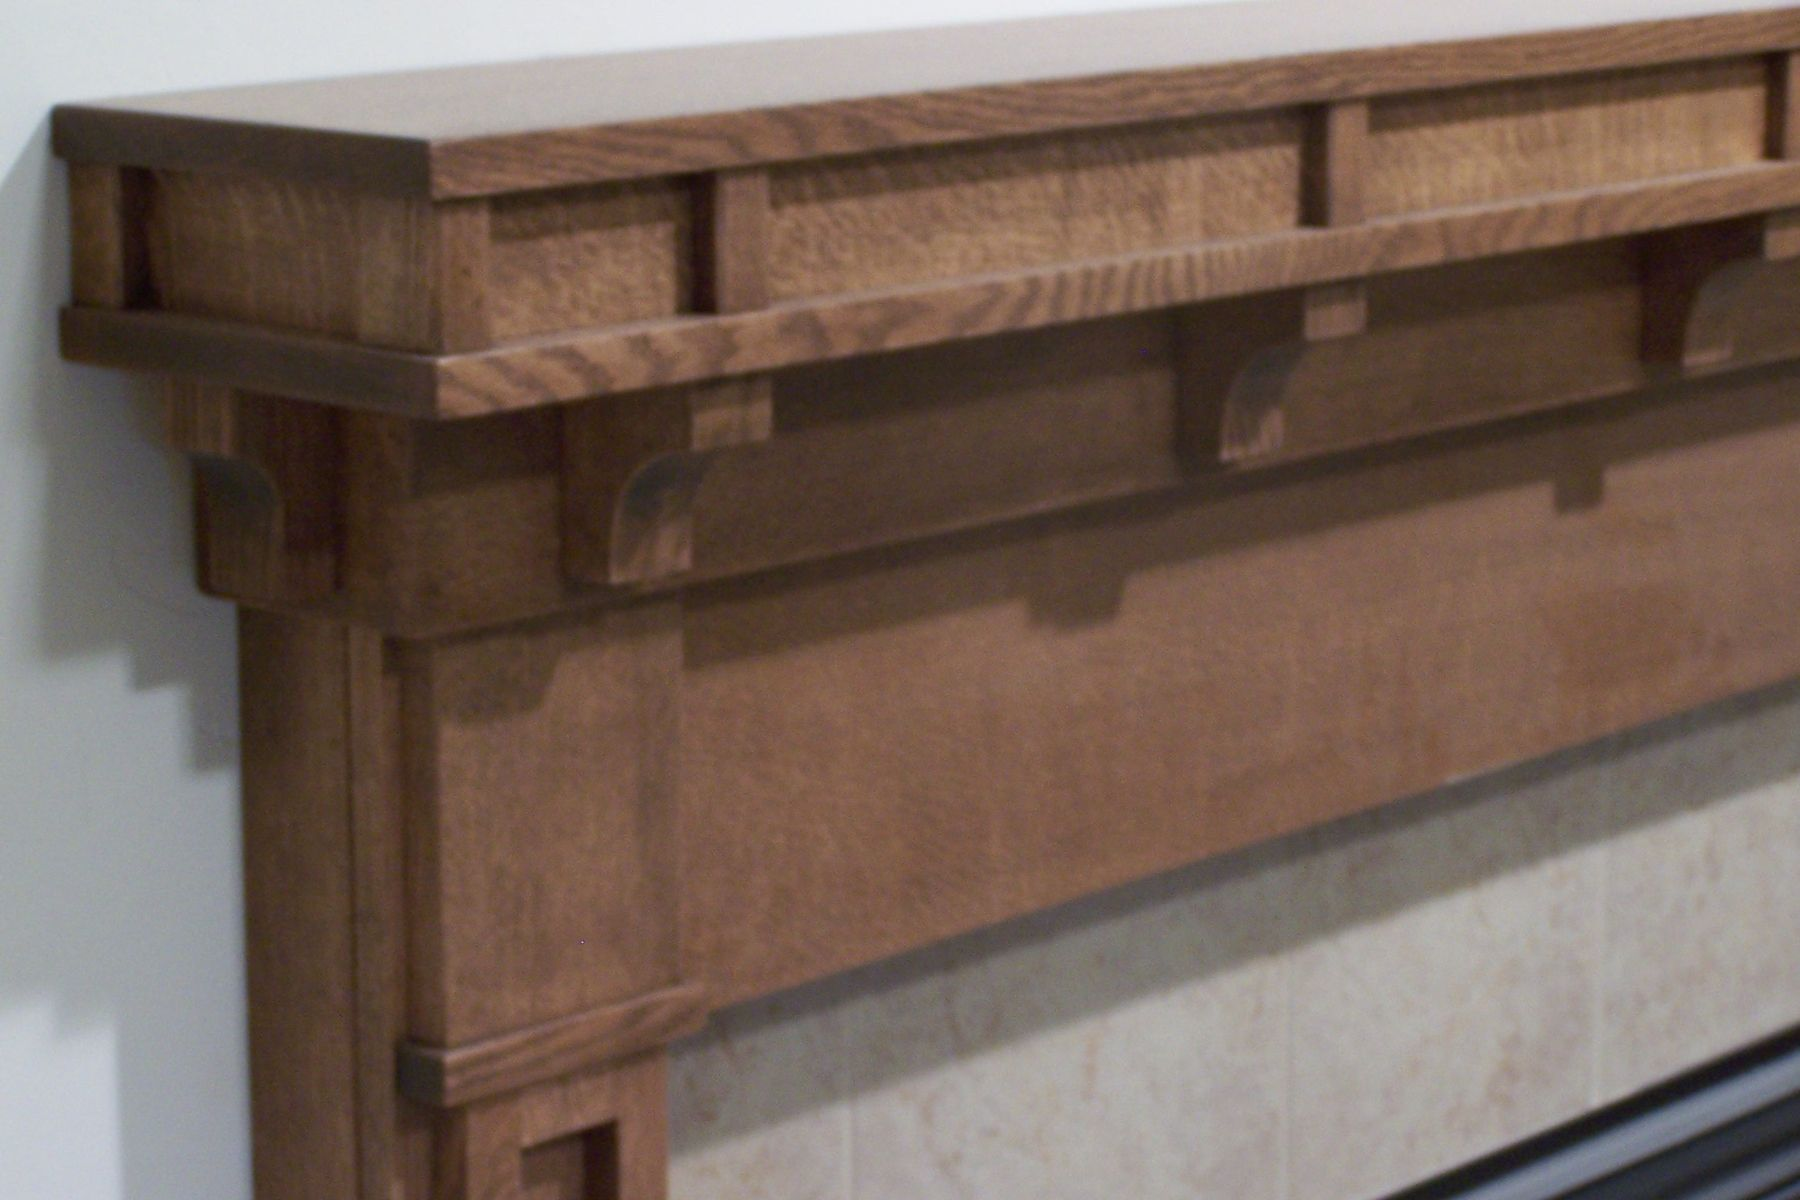 handmade craftsman style fireplace surround by custom woodgrains